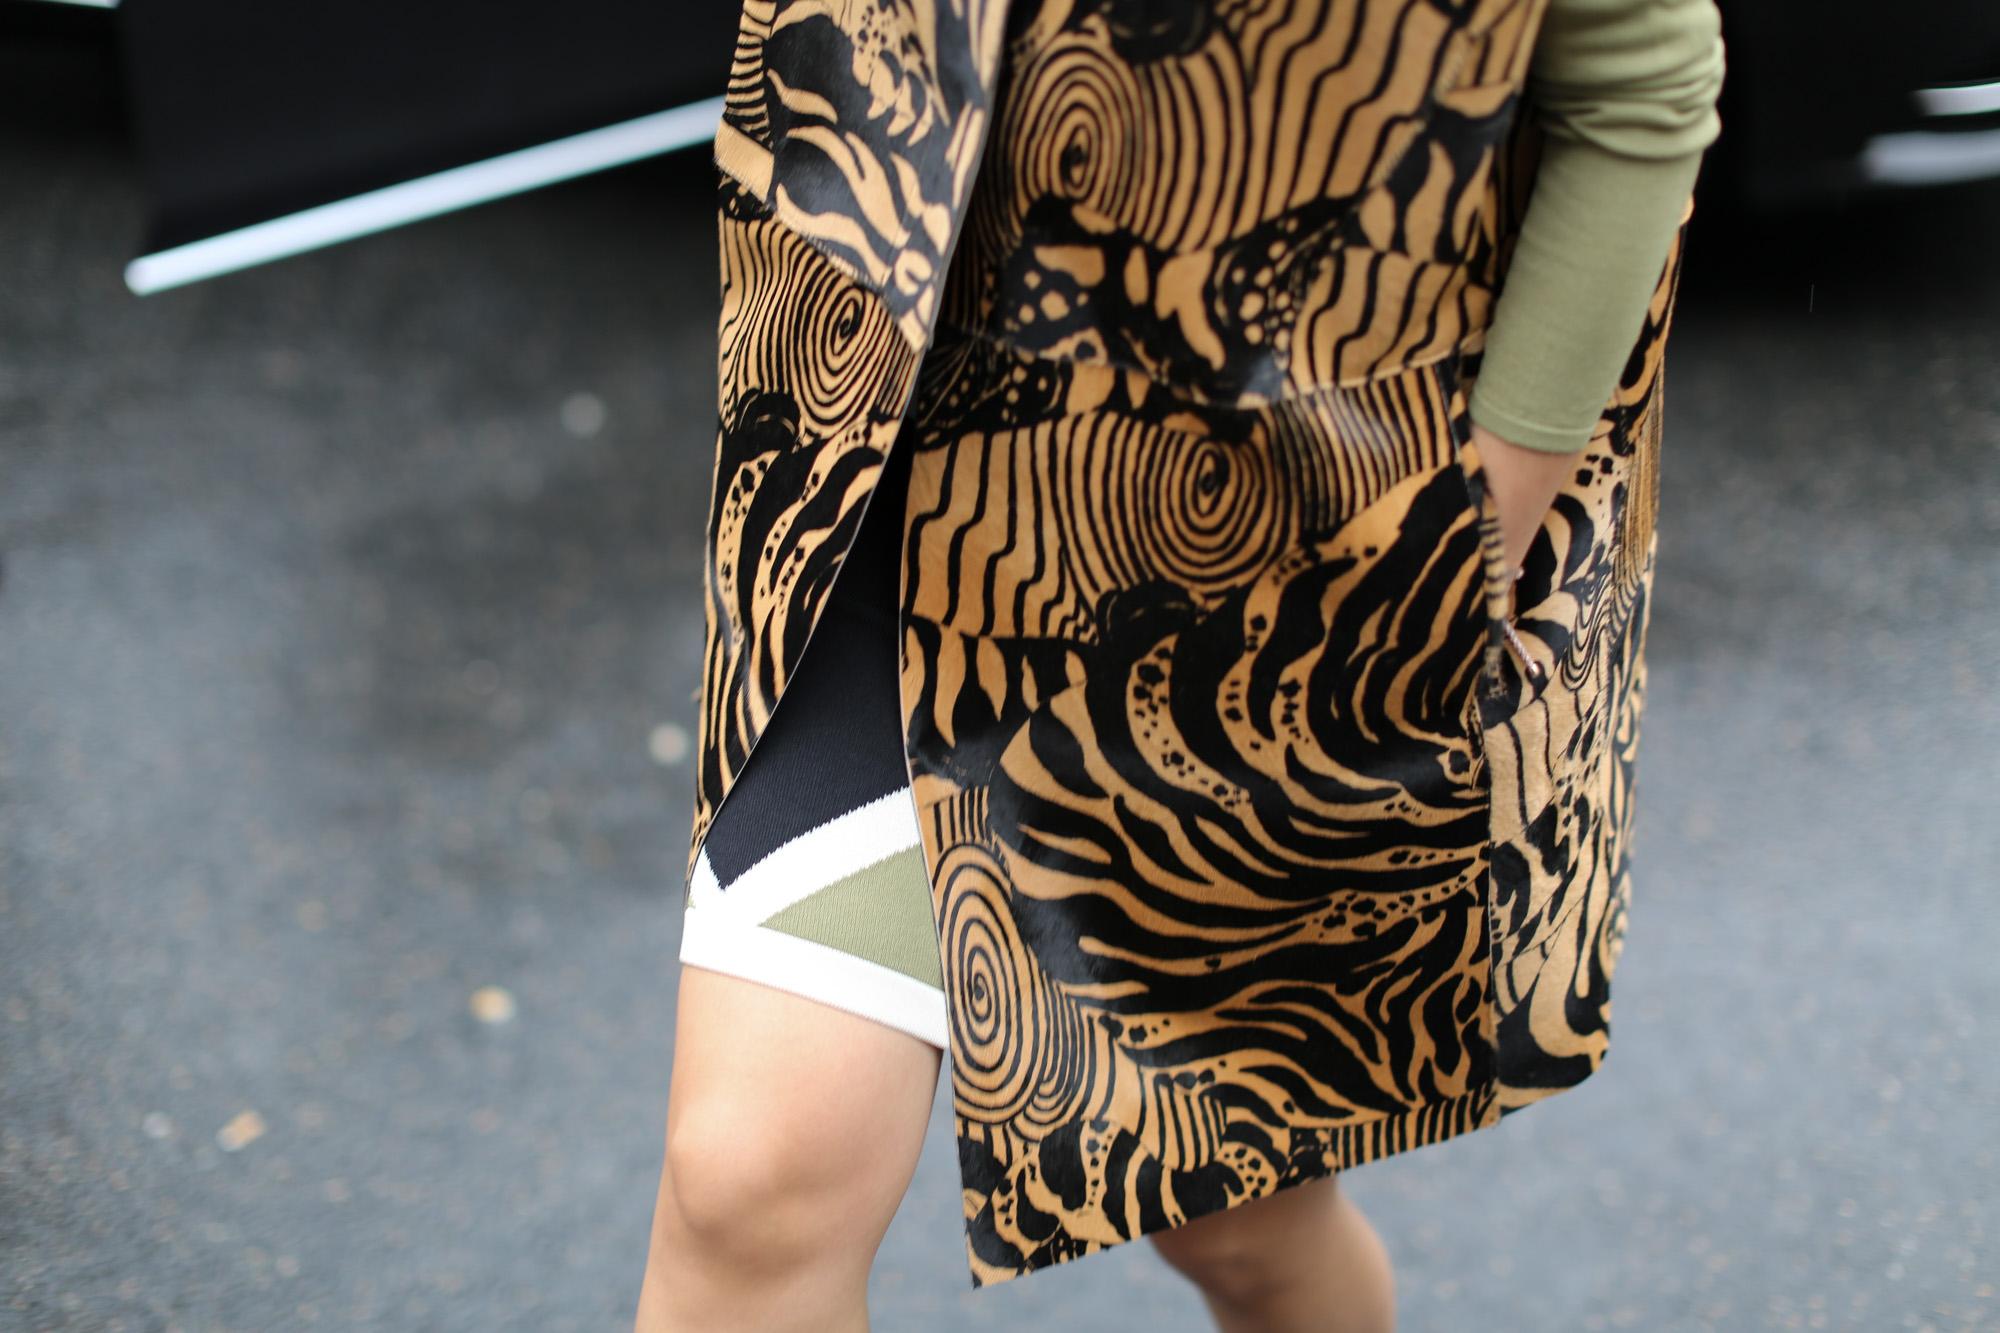 Clochet-streetstyle-caroline-issa-paris-fashion-week